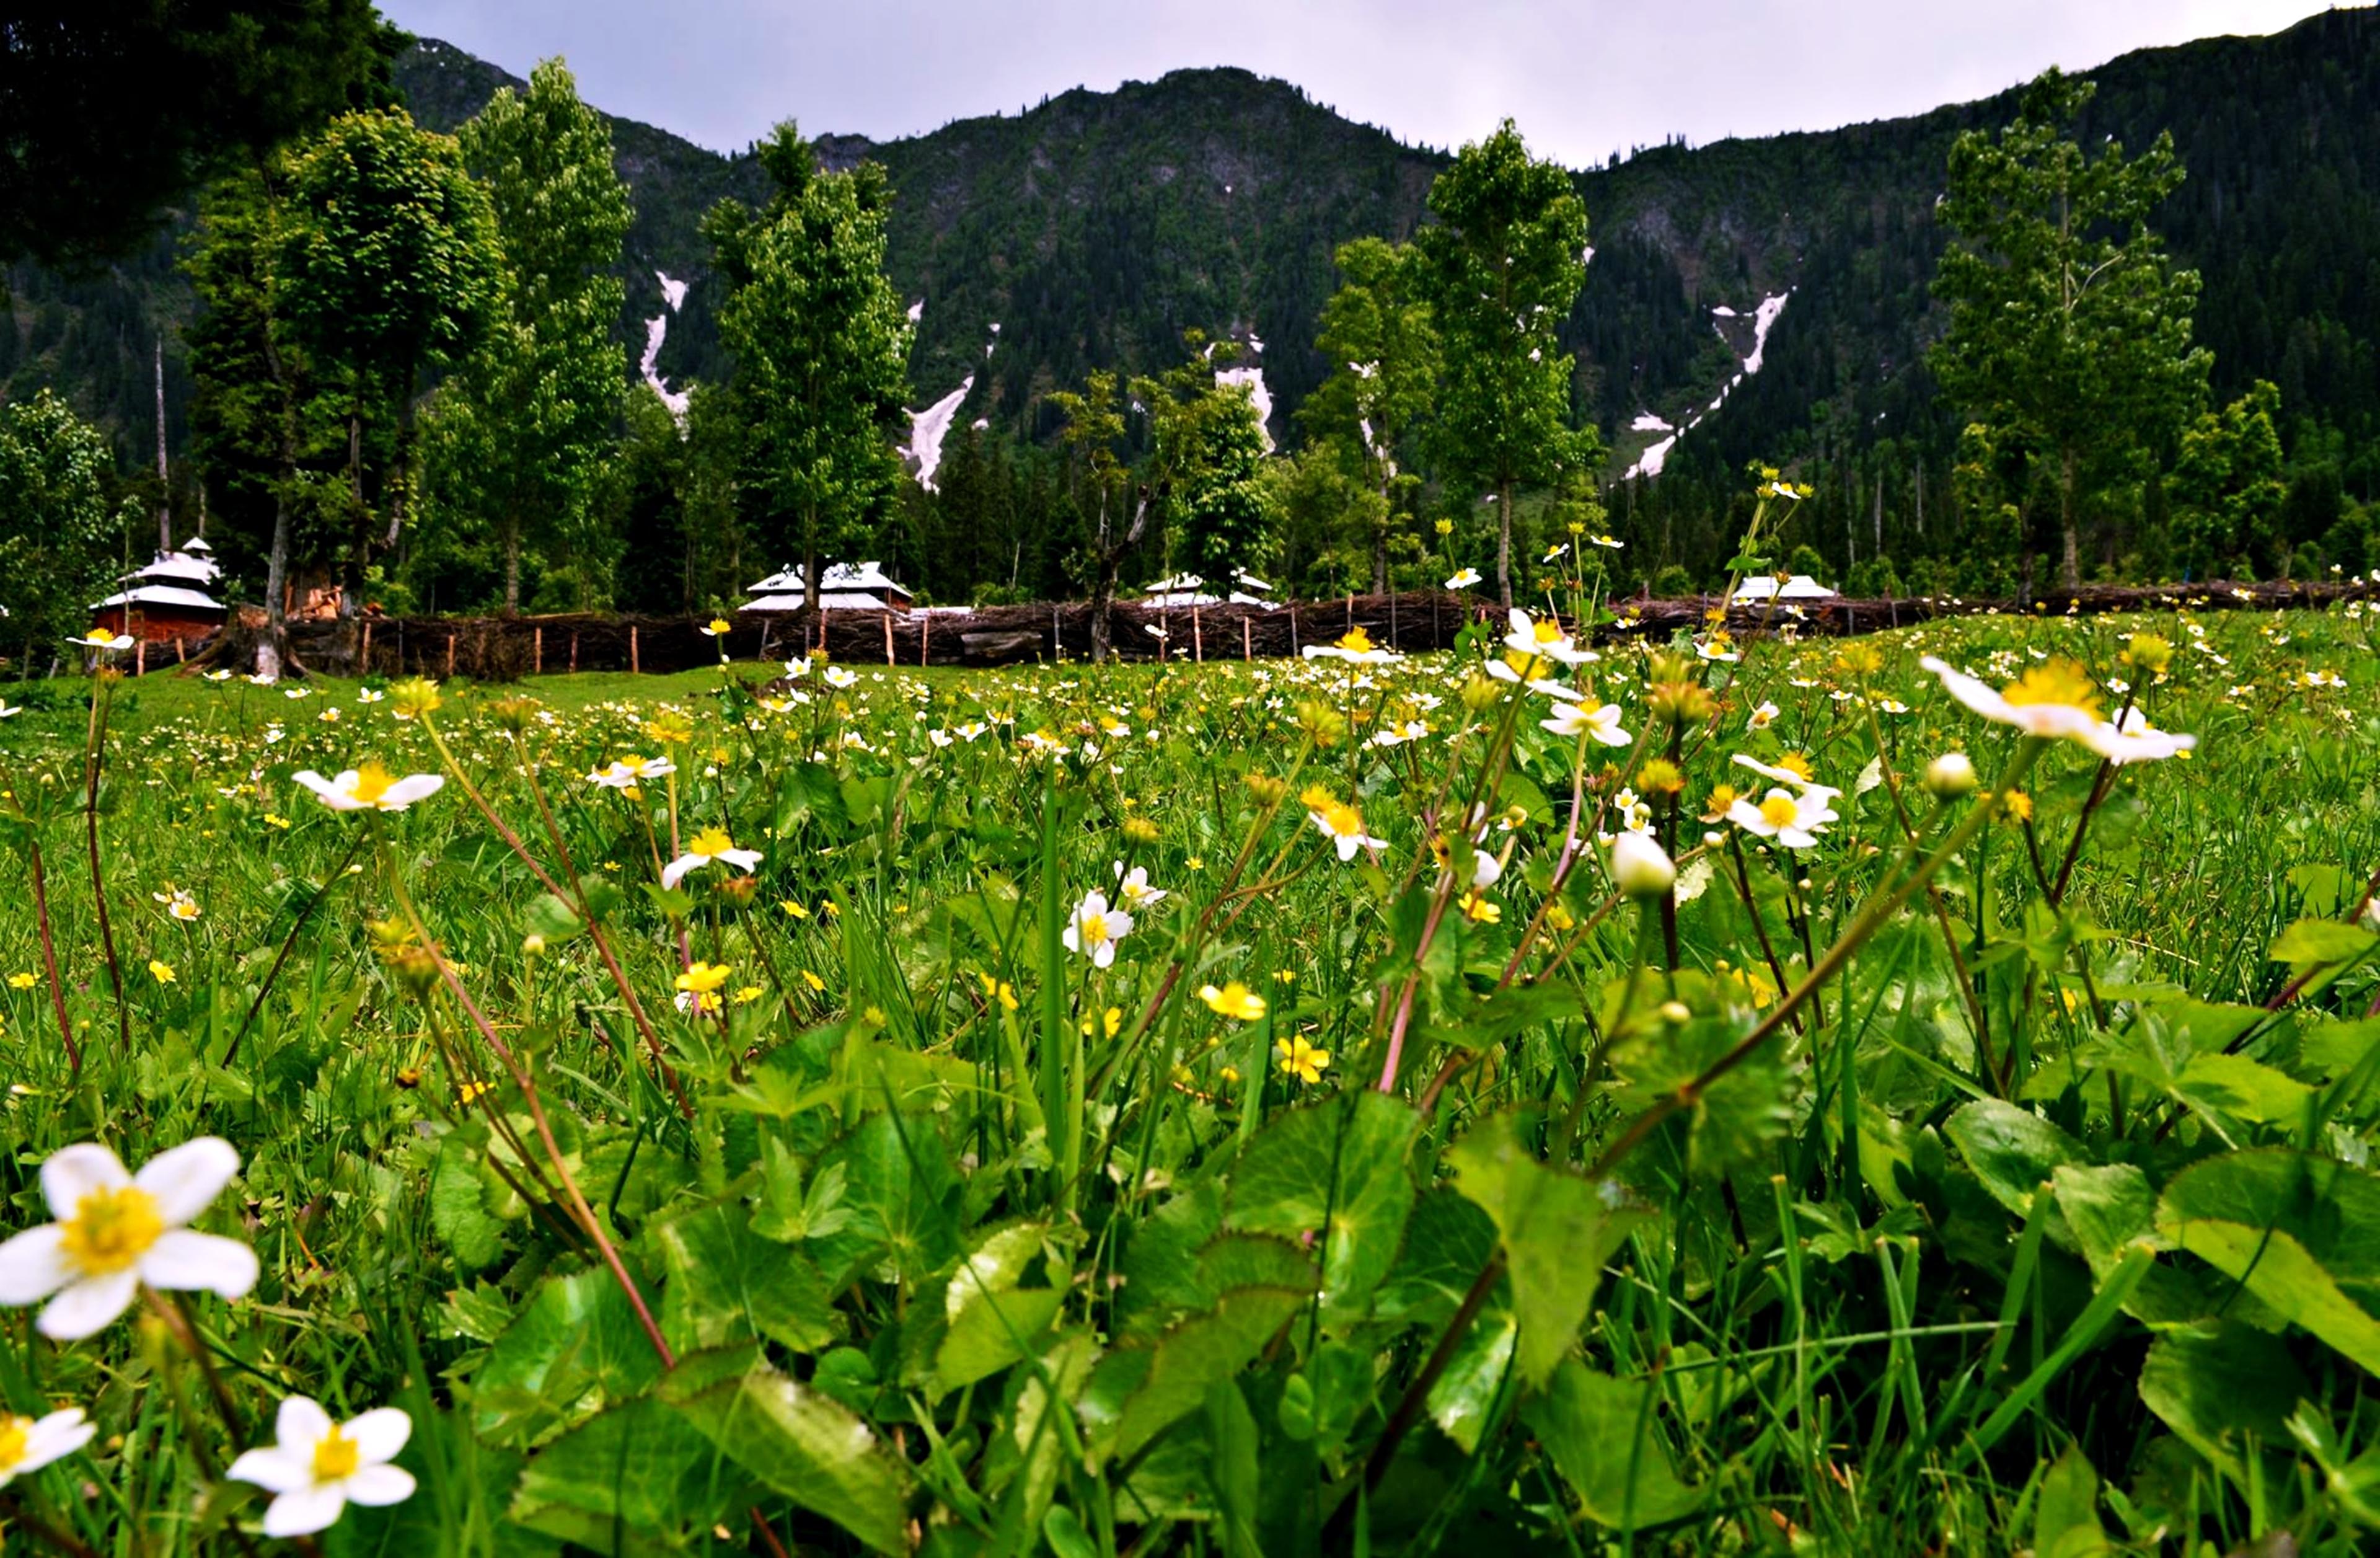 kashmir landscape 4k ultra